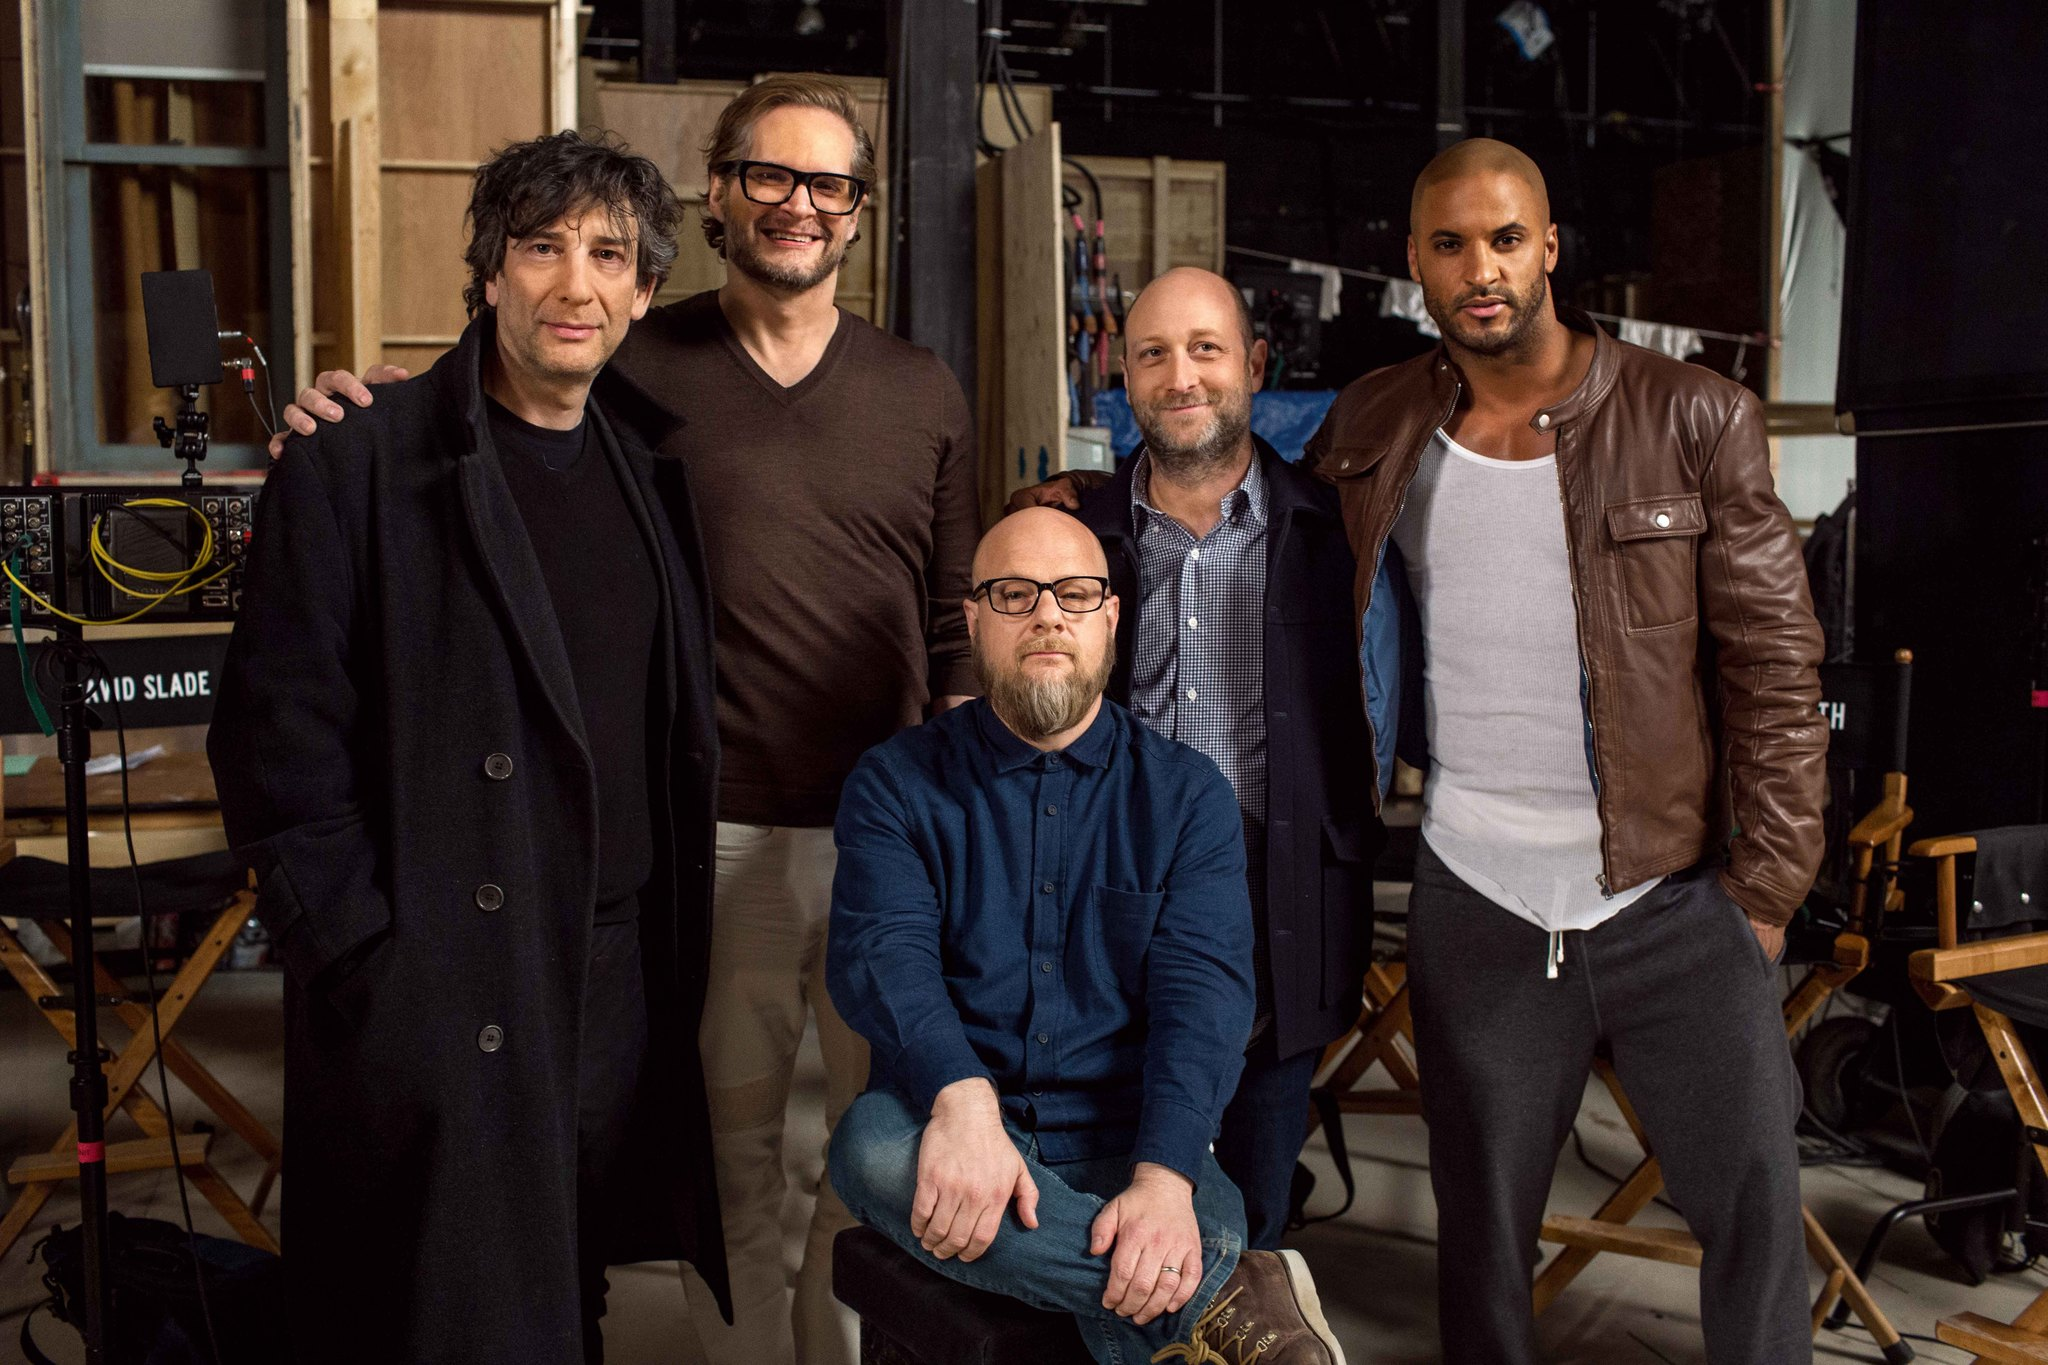 Bryan Fuller, Neil Gaiman, Michael Green, Ricky Whittle, and David Slade in American Gods (2017)